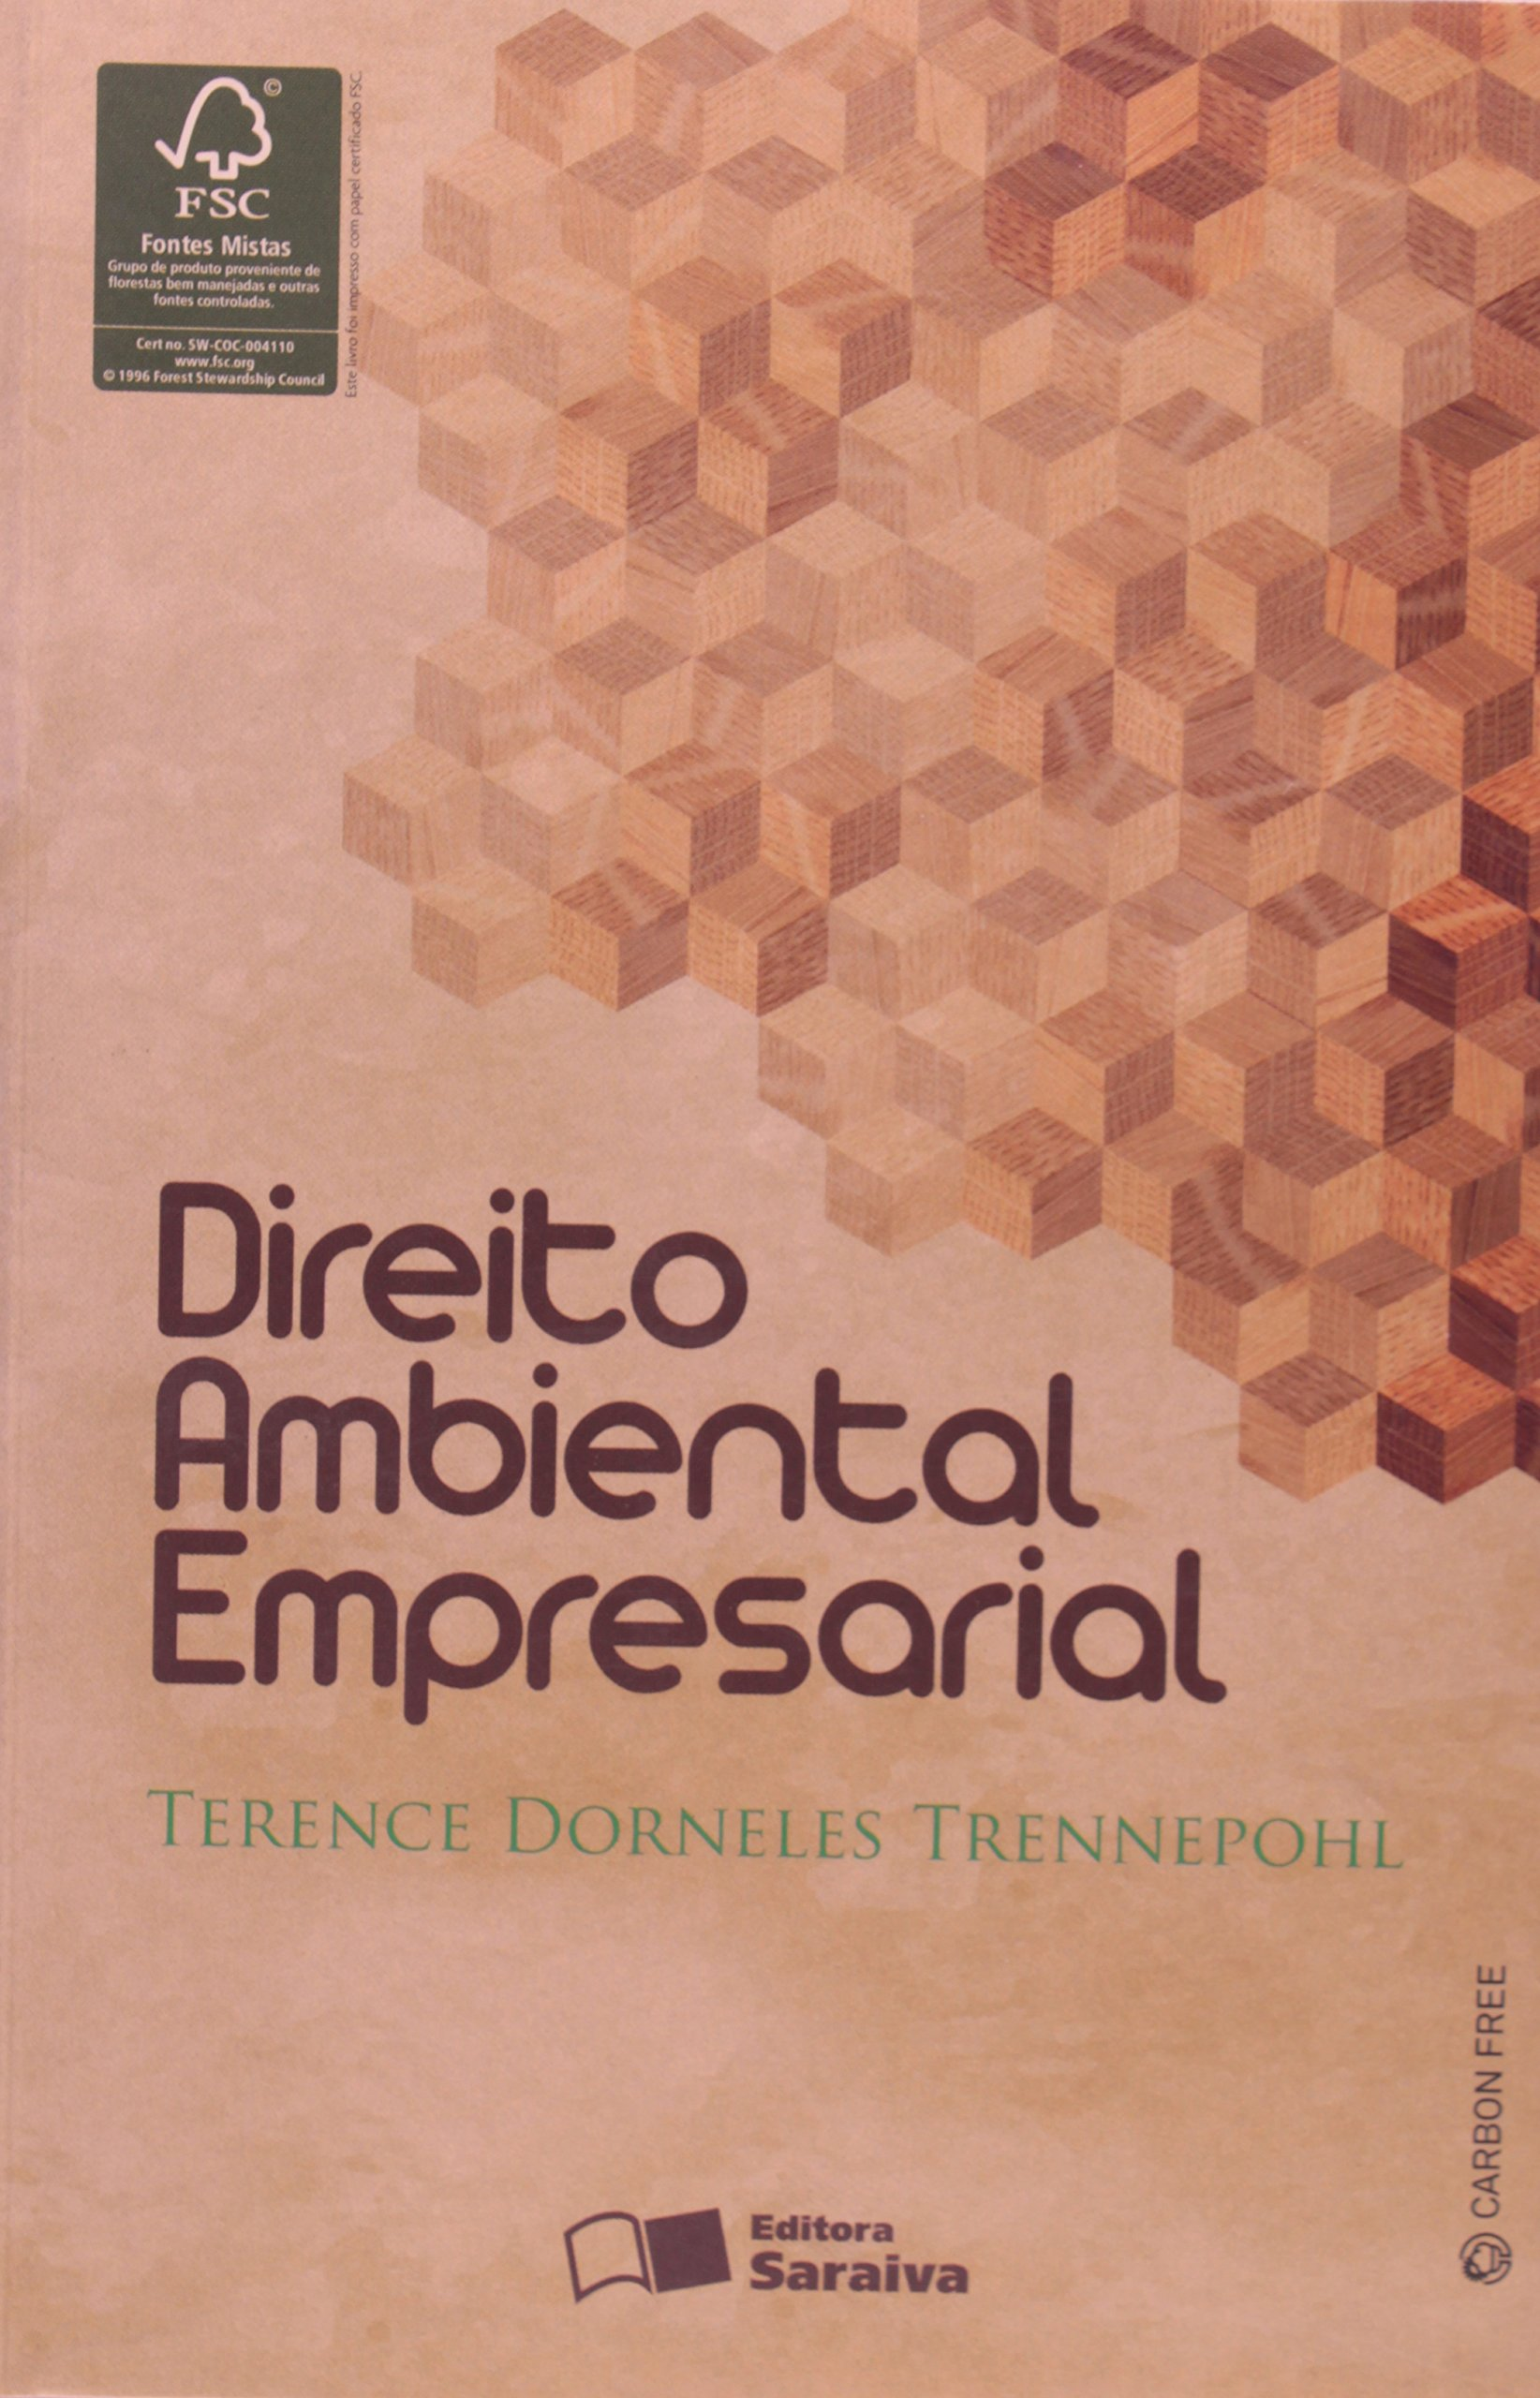 Direito Ambiental Empresarial (Portuguese Brazilian) Paperback – 2010